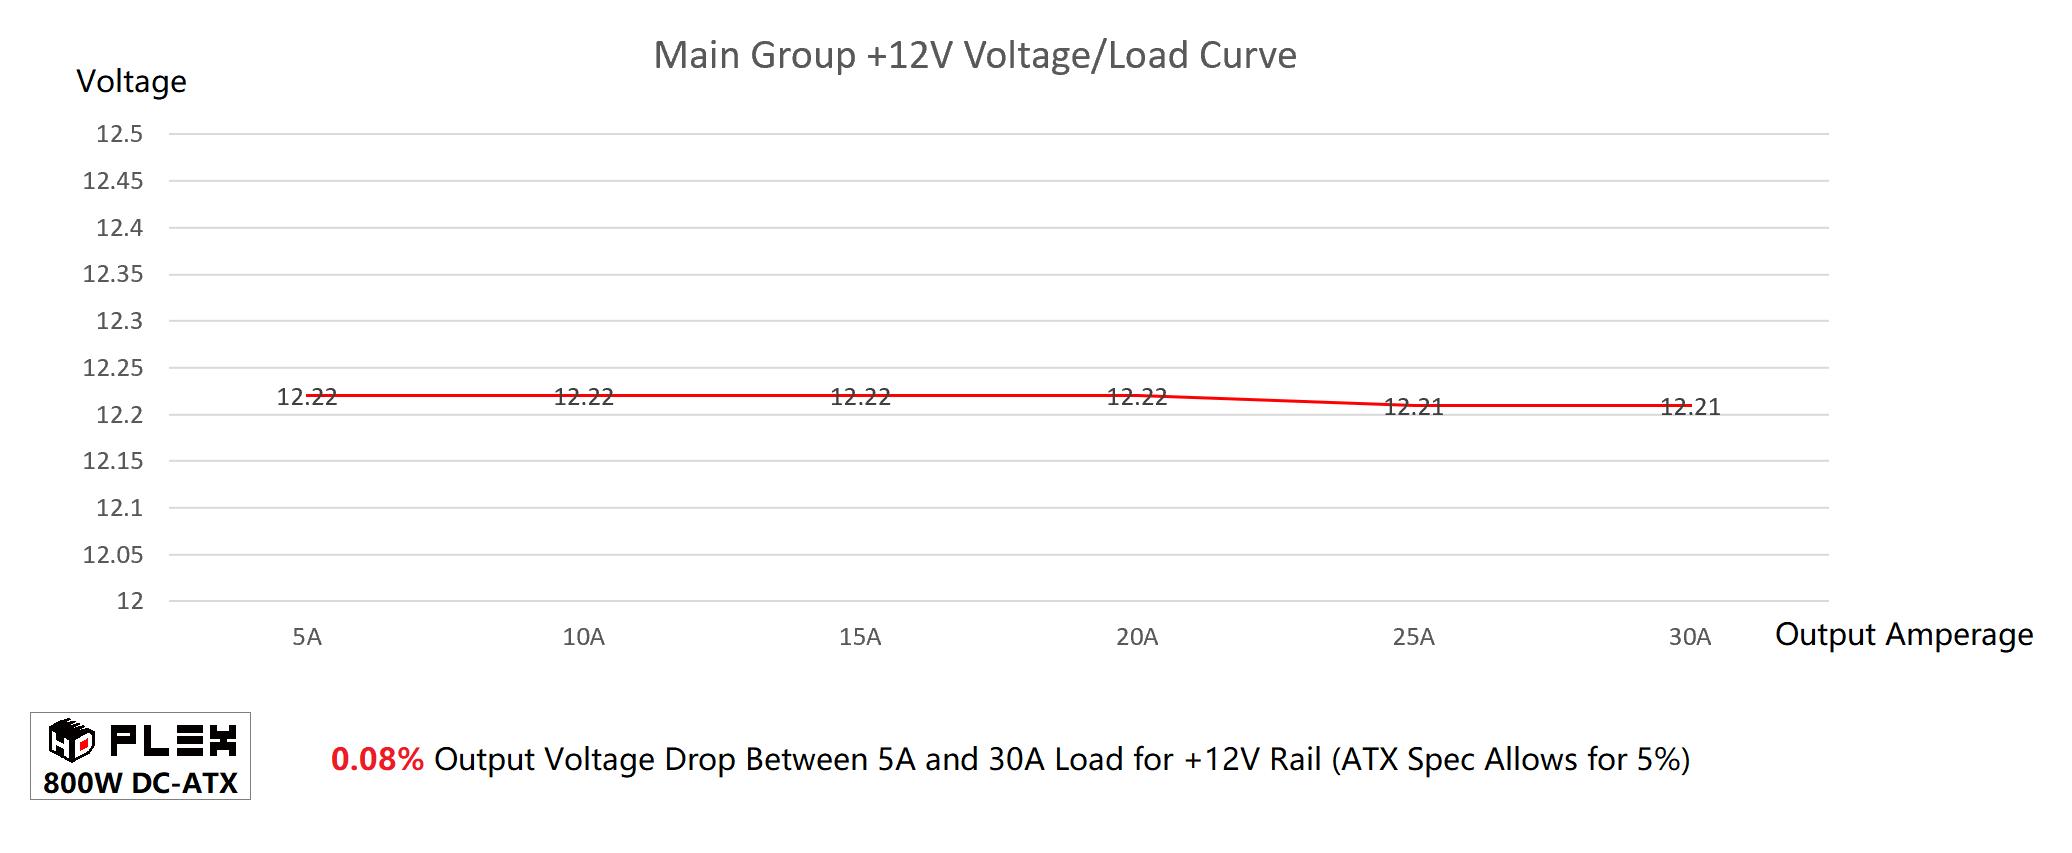 Hdplex 800w Dc Atx With 16v 63vdc Input